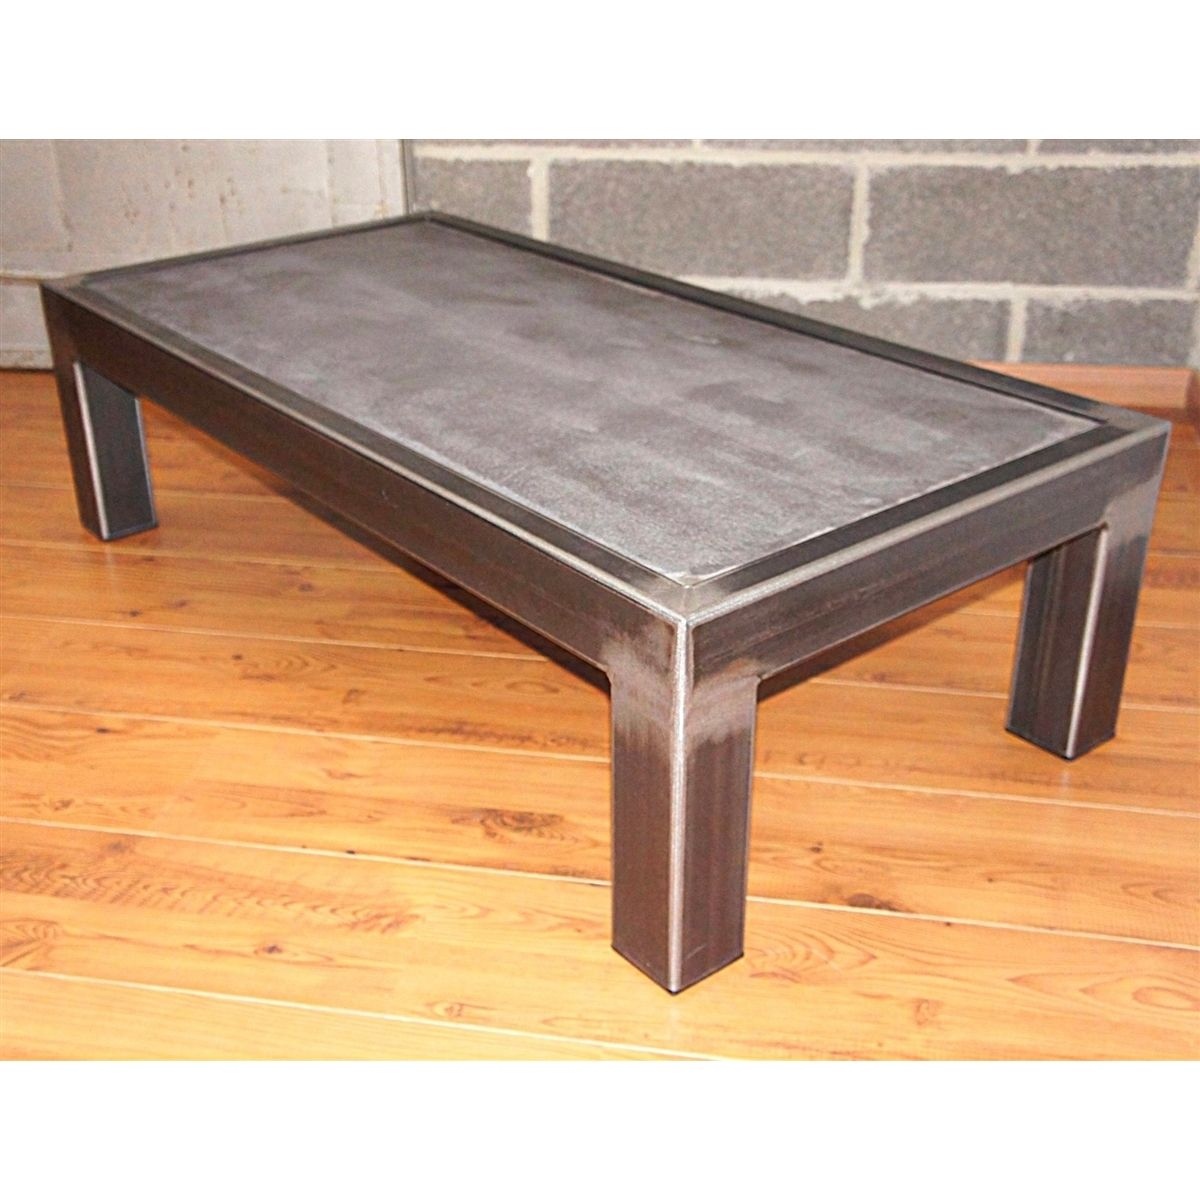 table basse m tal brut et b ton cir 120 x 60 x h 40. Black Bedroom Furniture Sets. Home Design Ideas